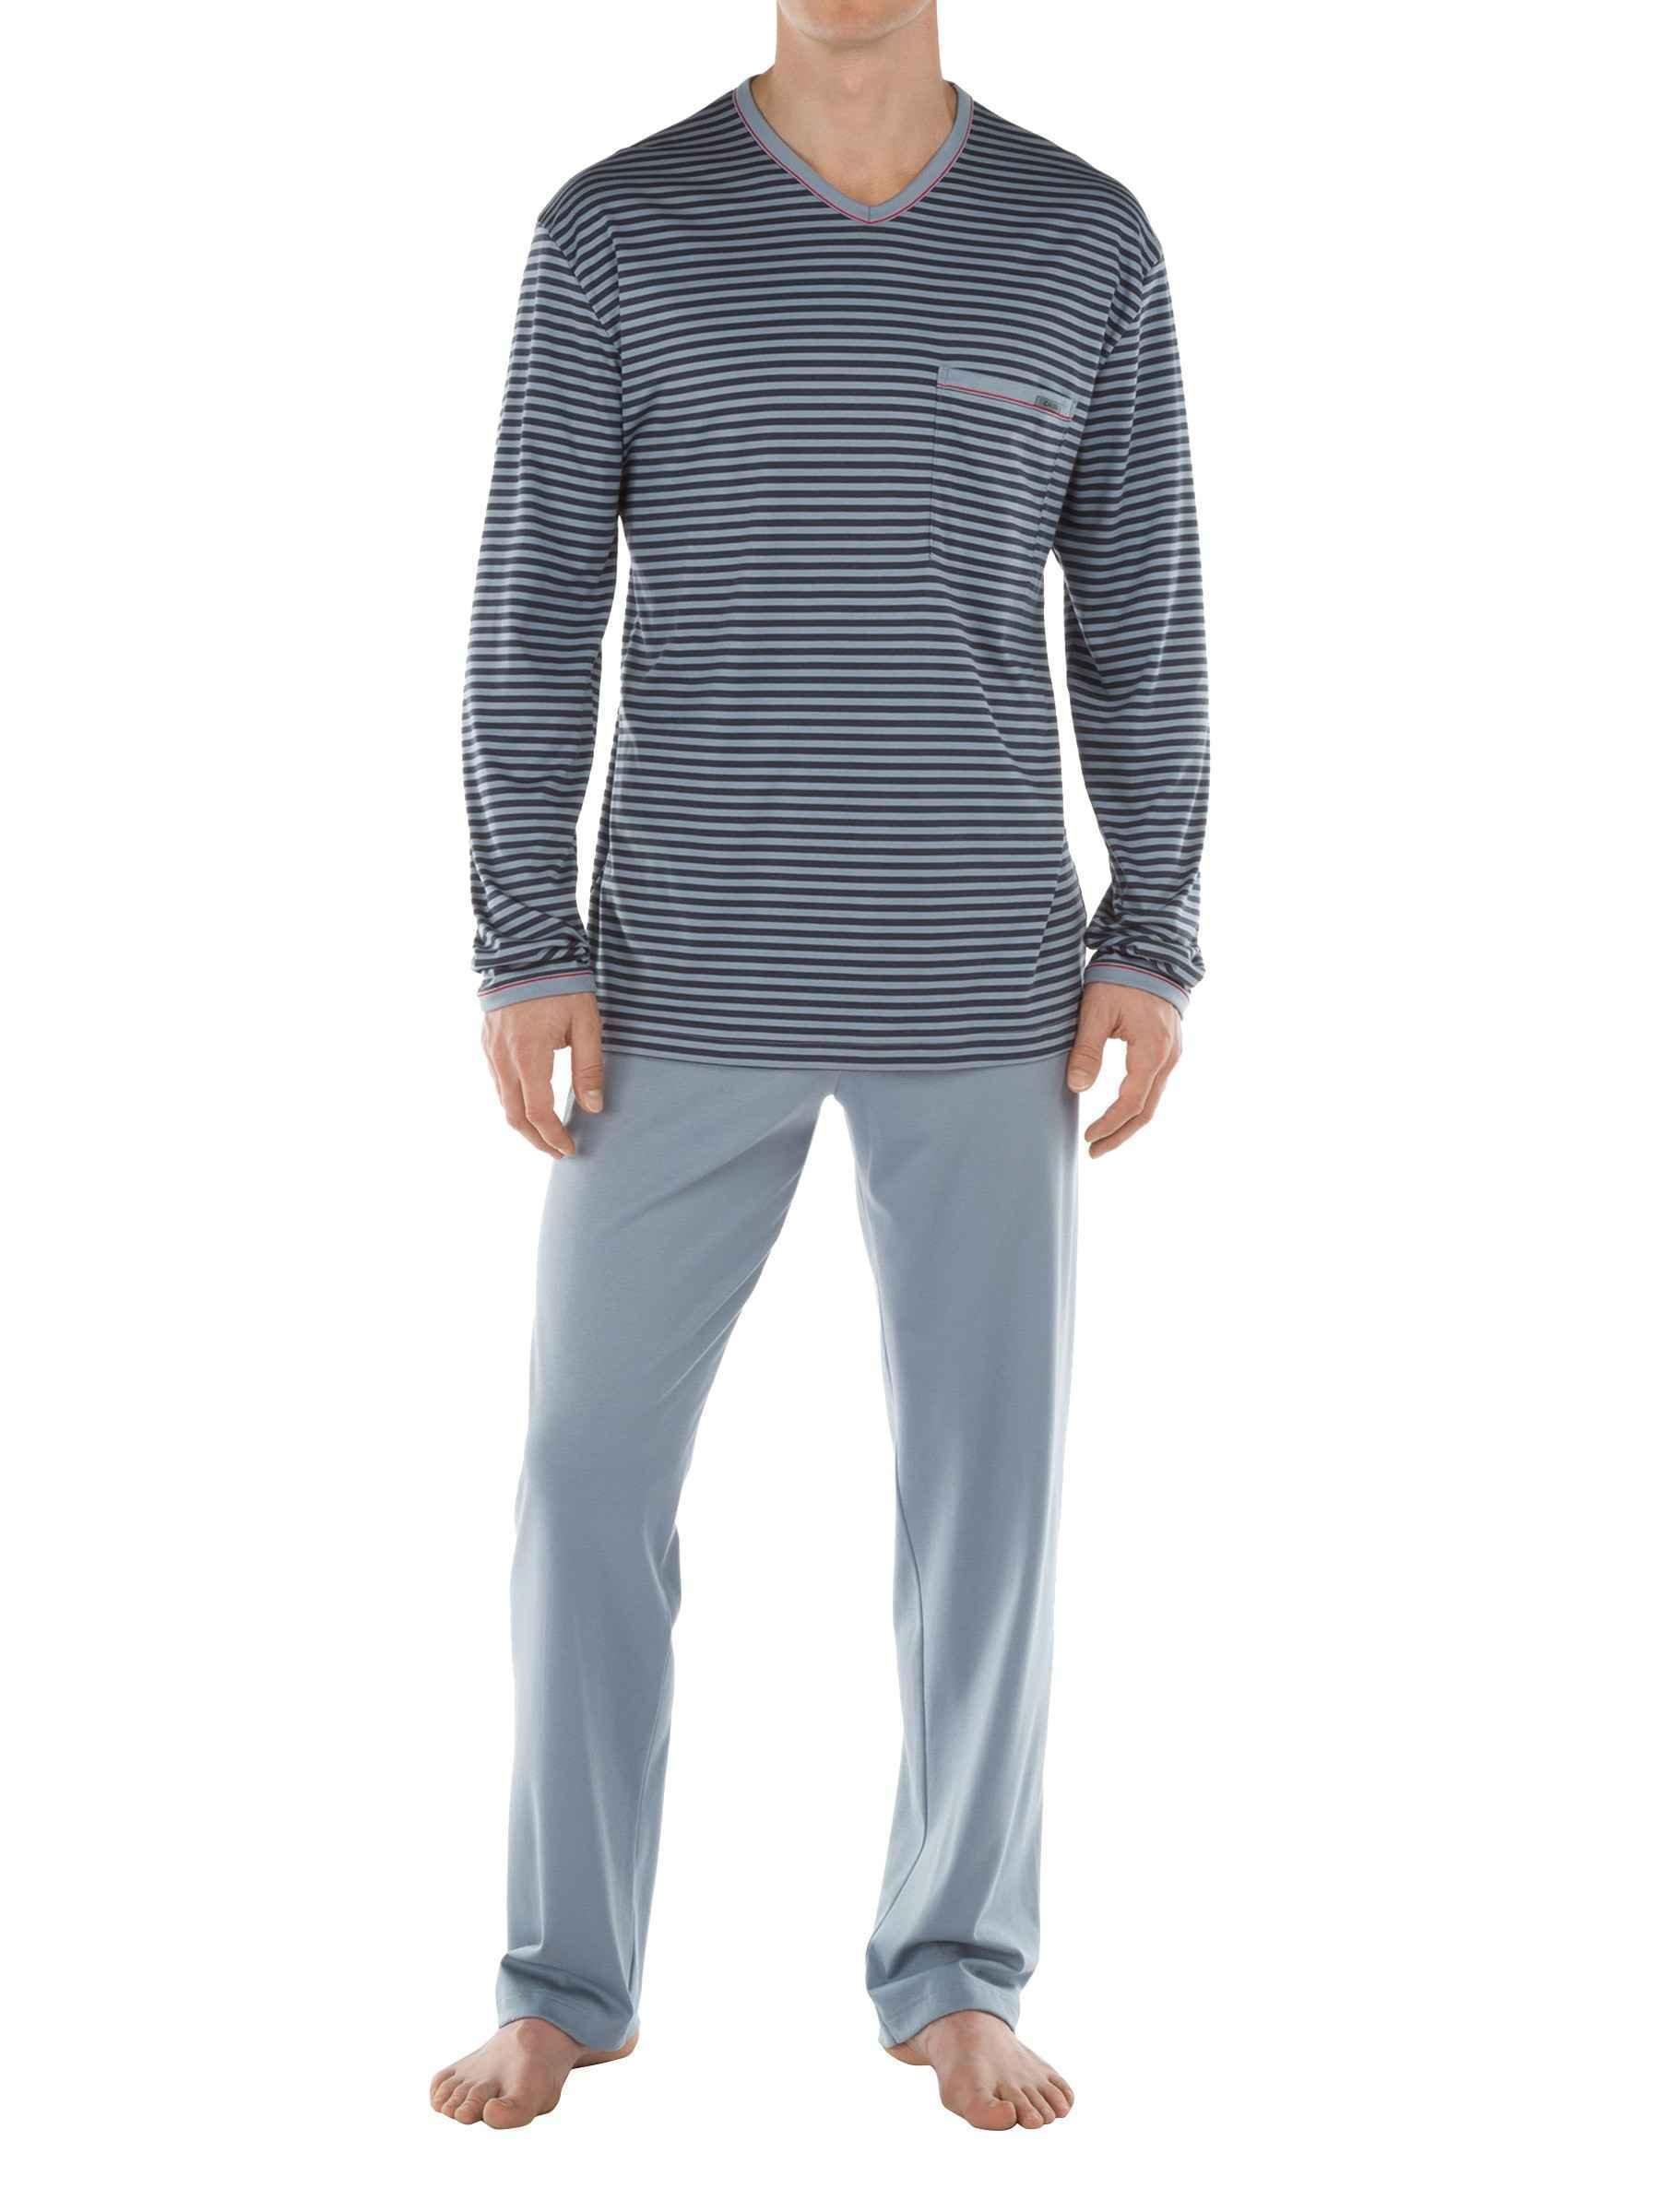 CALIDA mens v neck 100% cotton knit pajamas set SANSIBAR 46265 (X-large, 983)